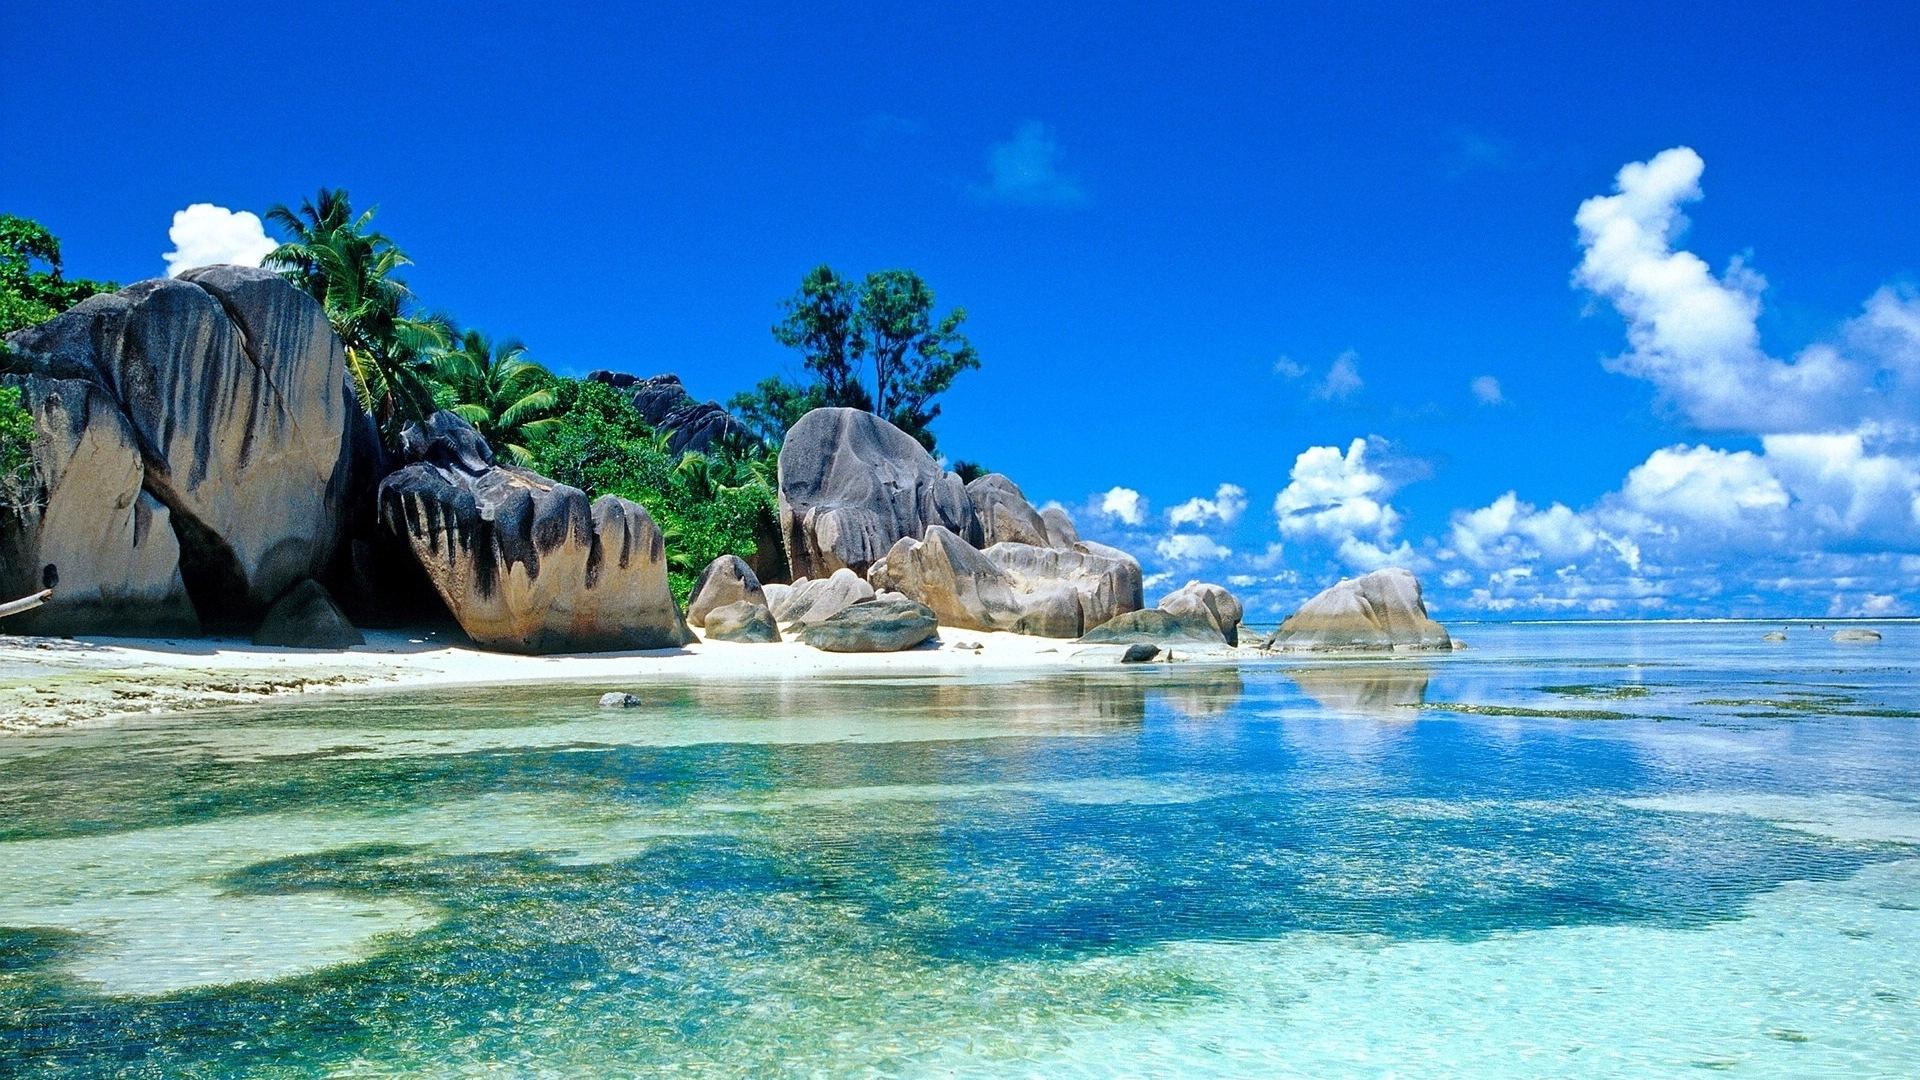 Islas Seychelles Naturaleza Paisaje Hd Wallpapers 11